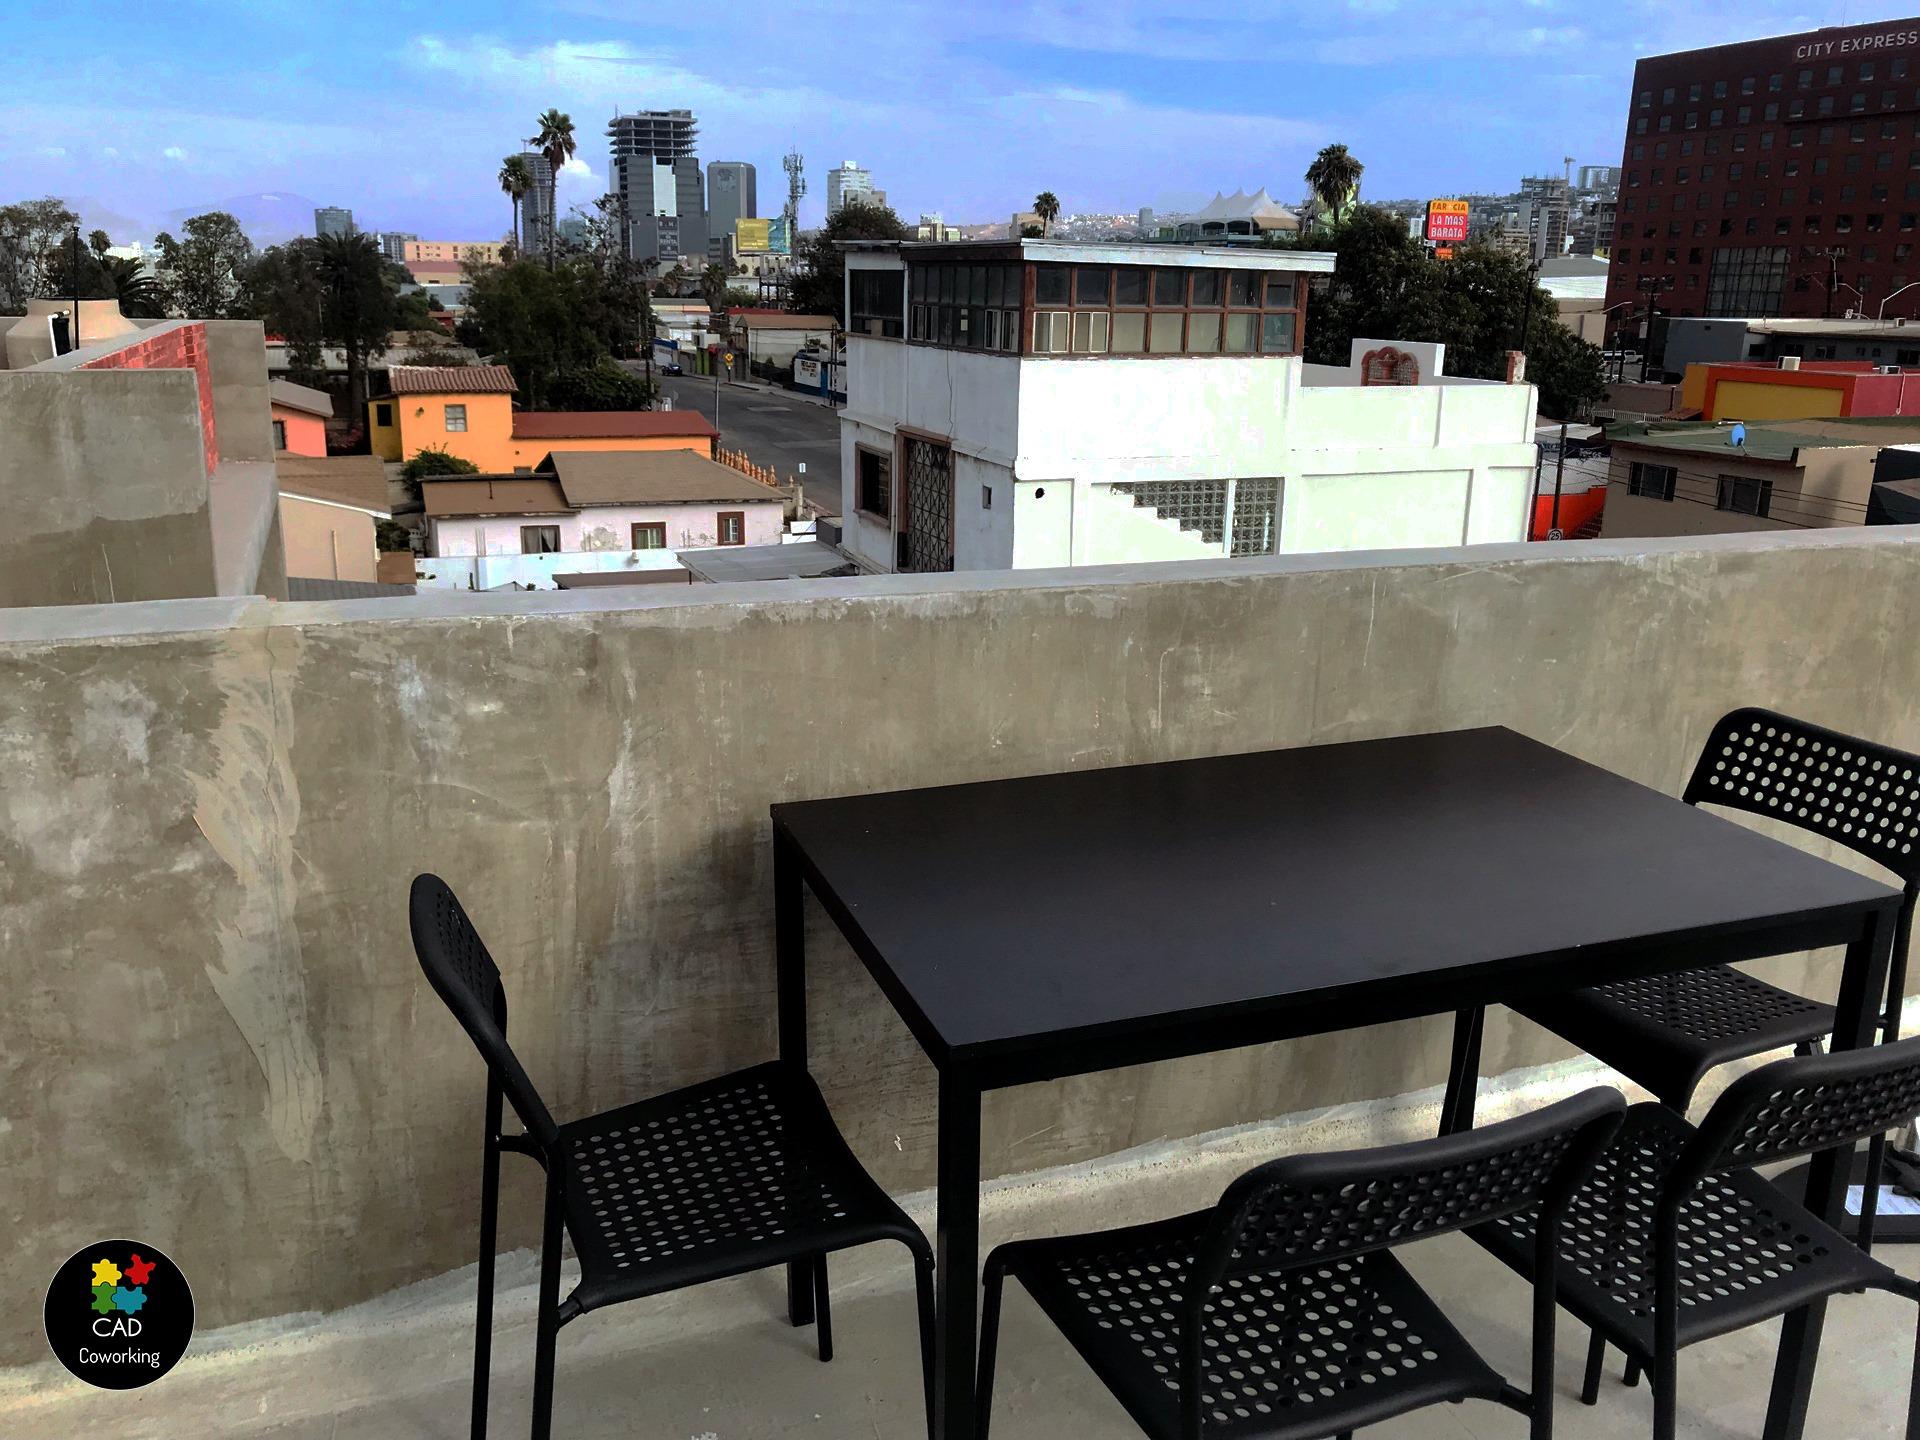 CAD Coworking Space, Tijuana